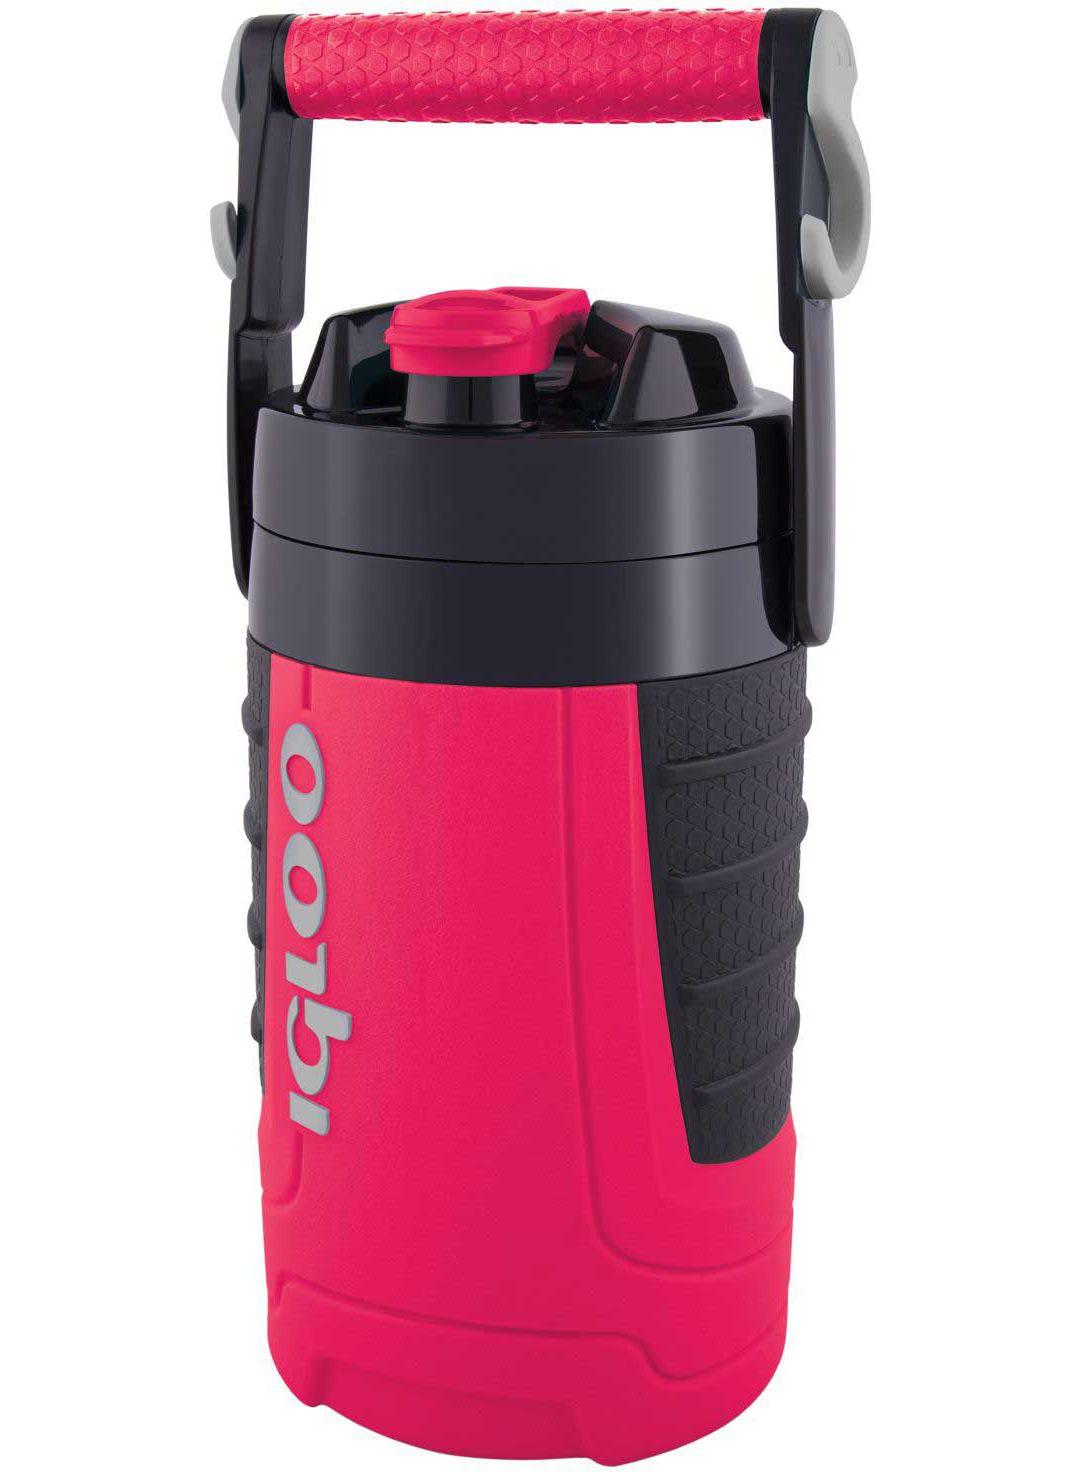 d81f83a9be Igloo Proformance 1/2 Gallon Jug | DICK'S Sporting Goods